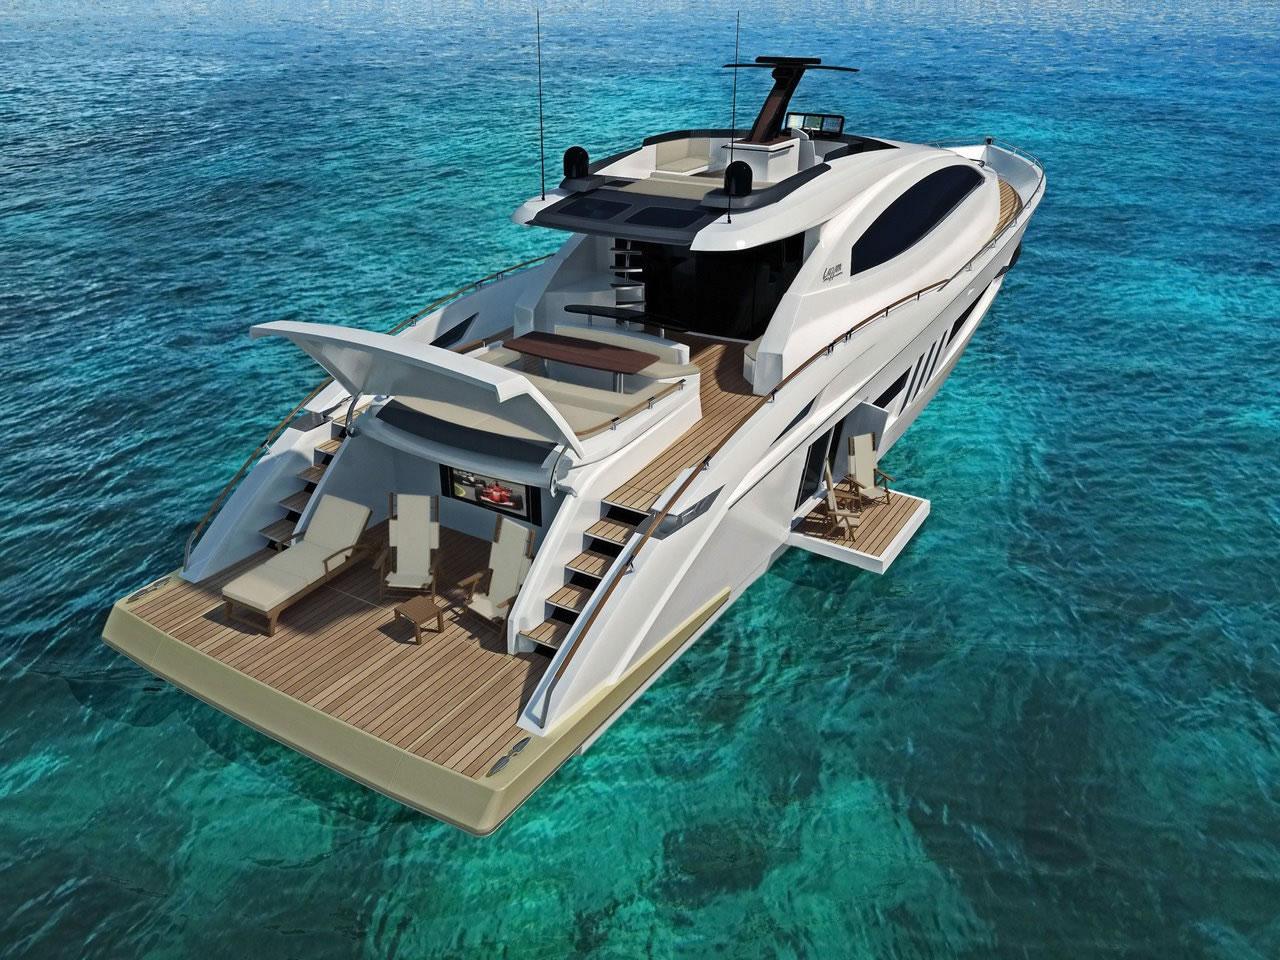 lazzara lsx ninety two luxusyacht. Black Bedroom Furniture Sets. Home Design Ideas